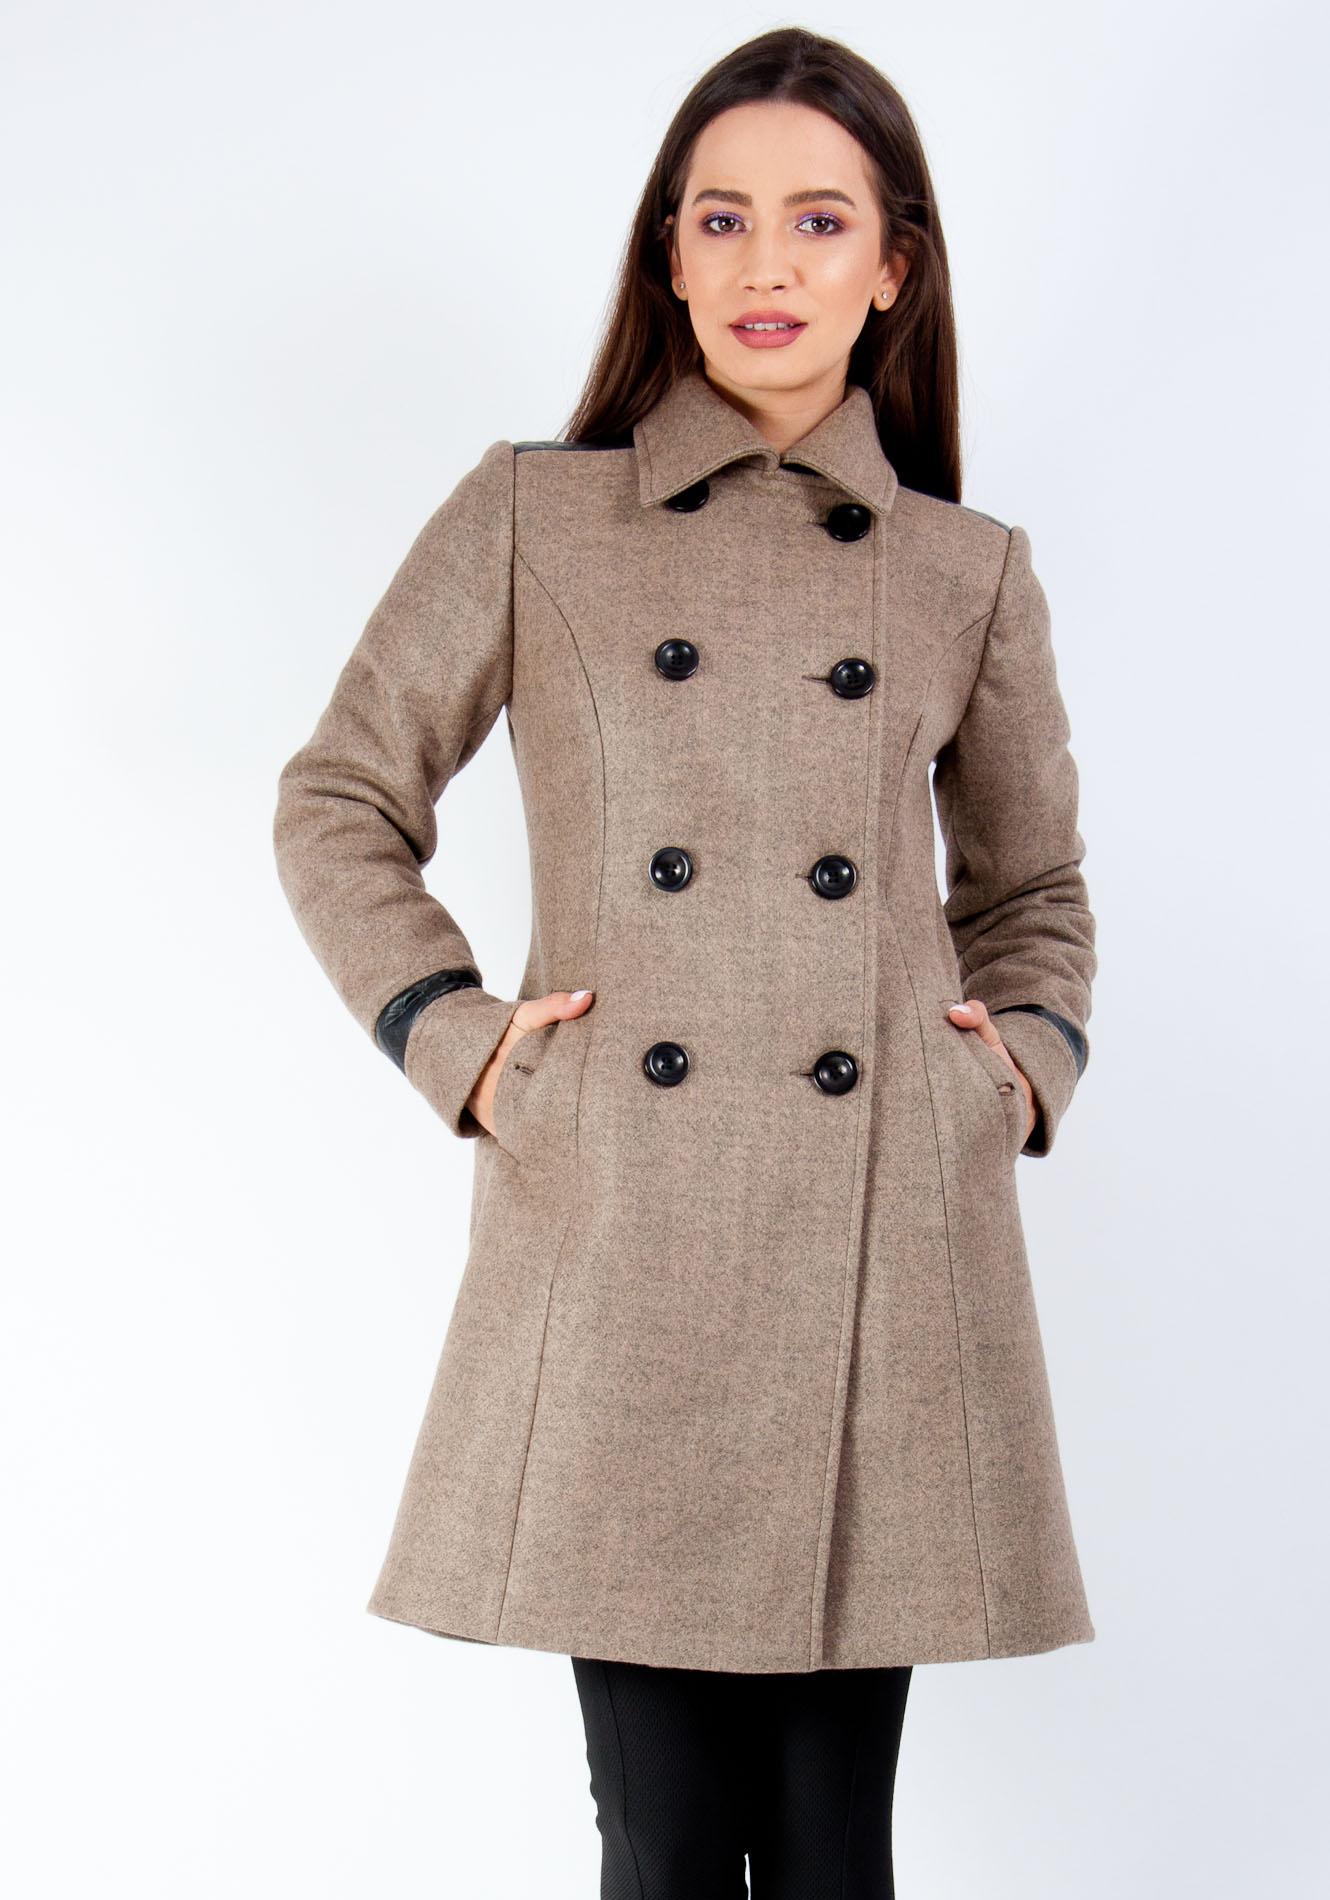 Palton iarna cu rever gri bej 36